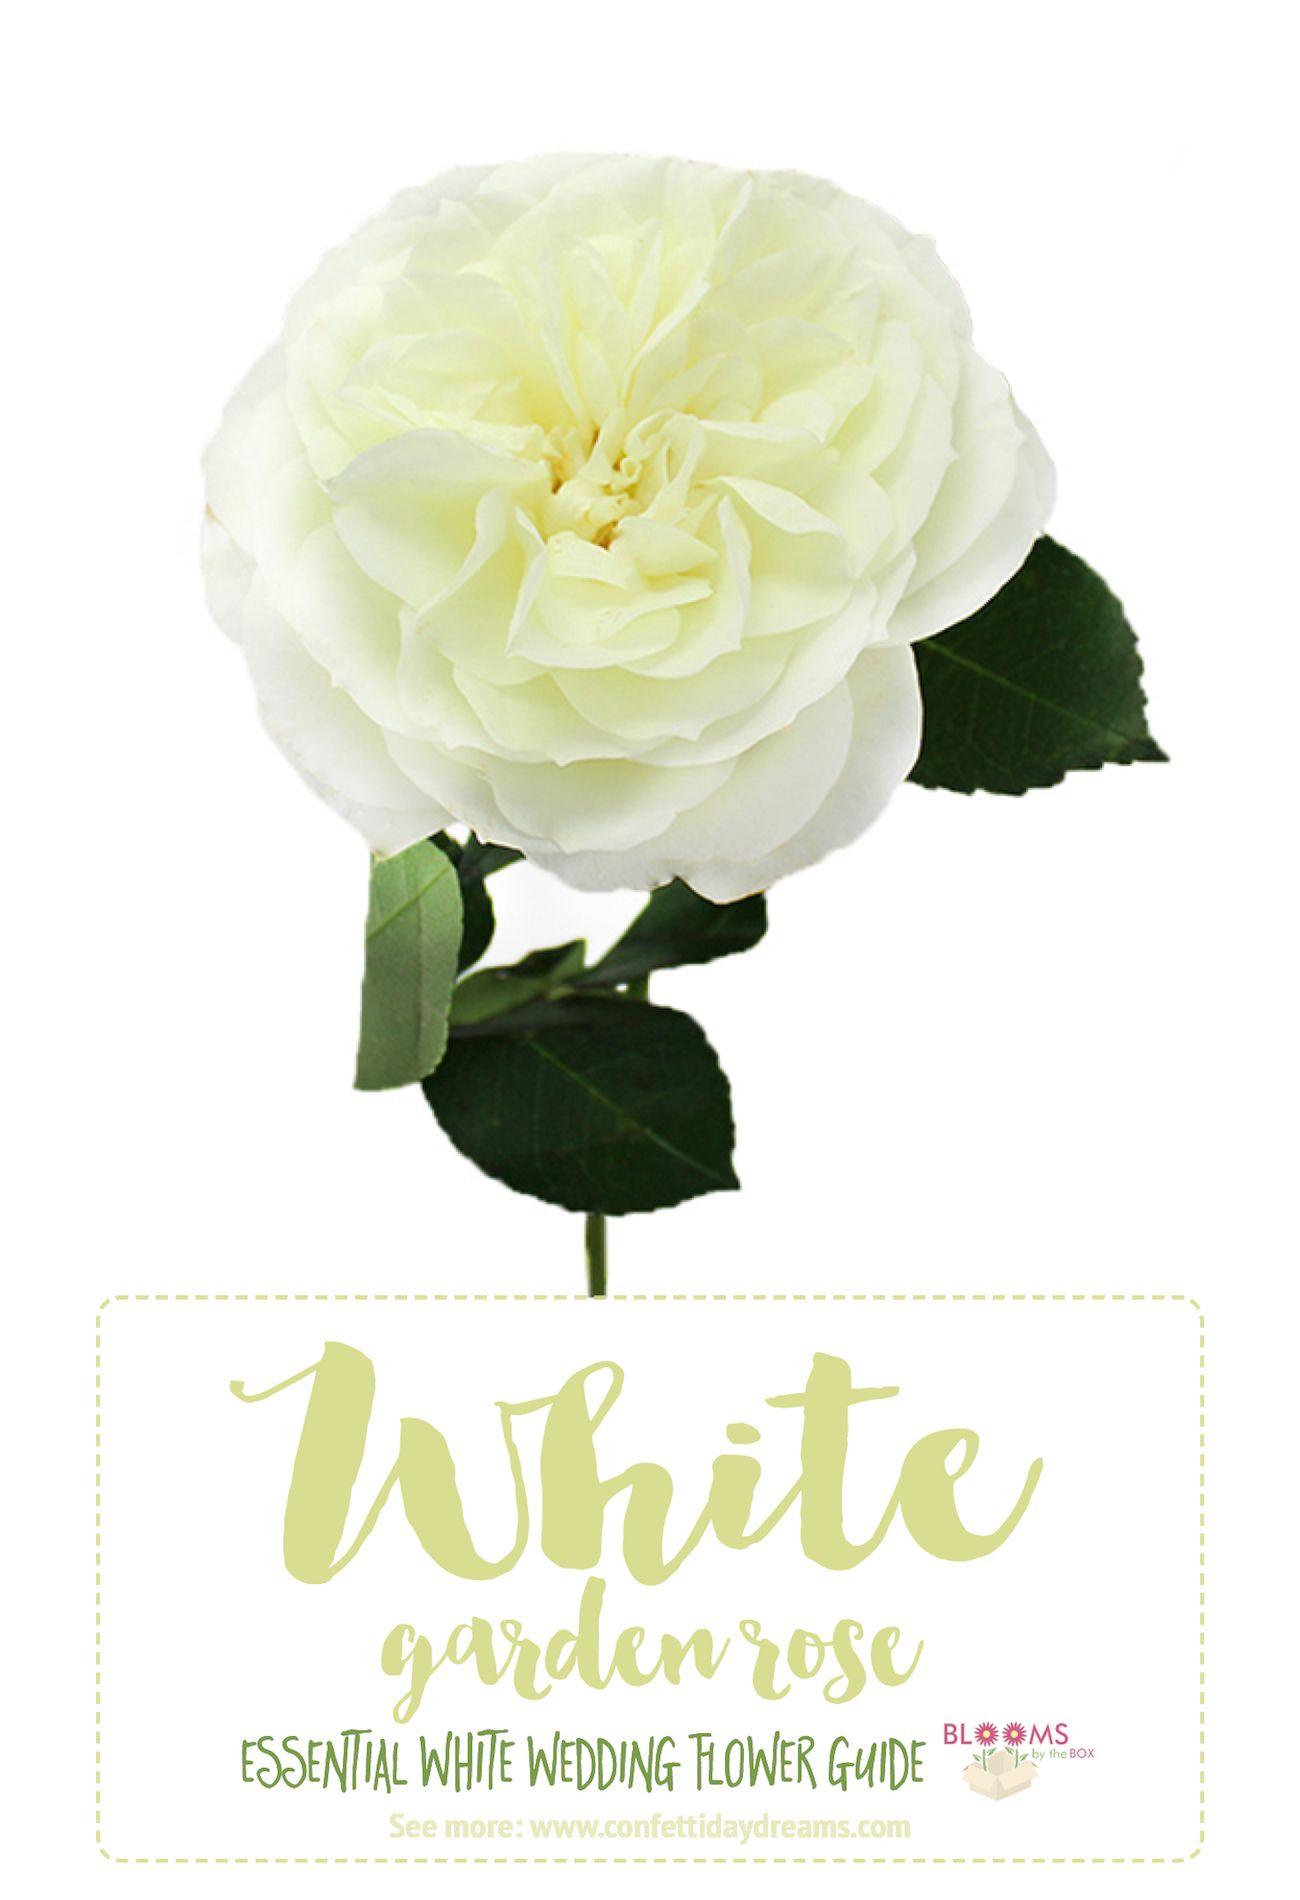 Essential White Wedding Flower Guide: Names, Types + Pics | White ...